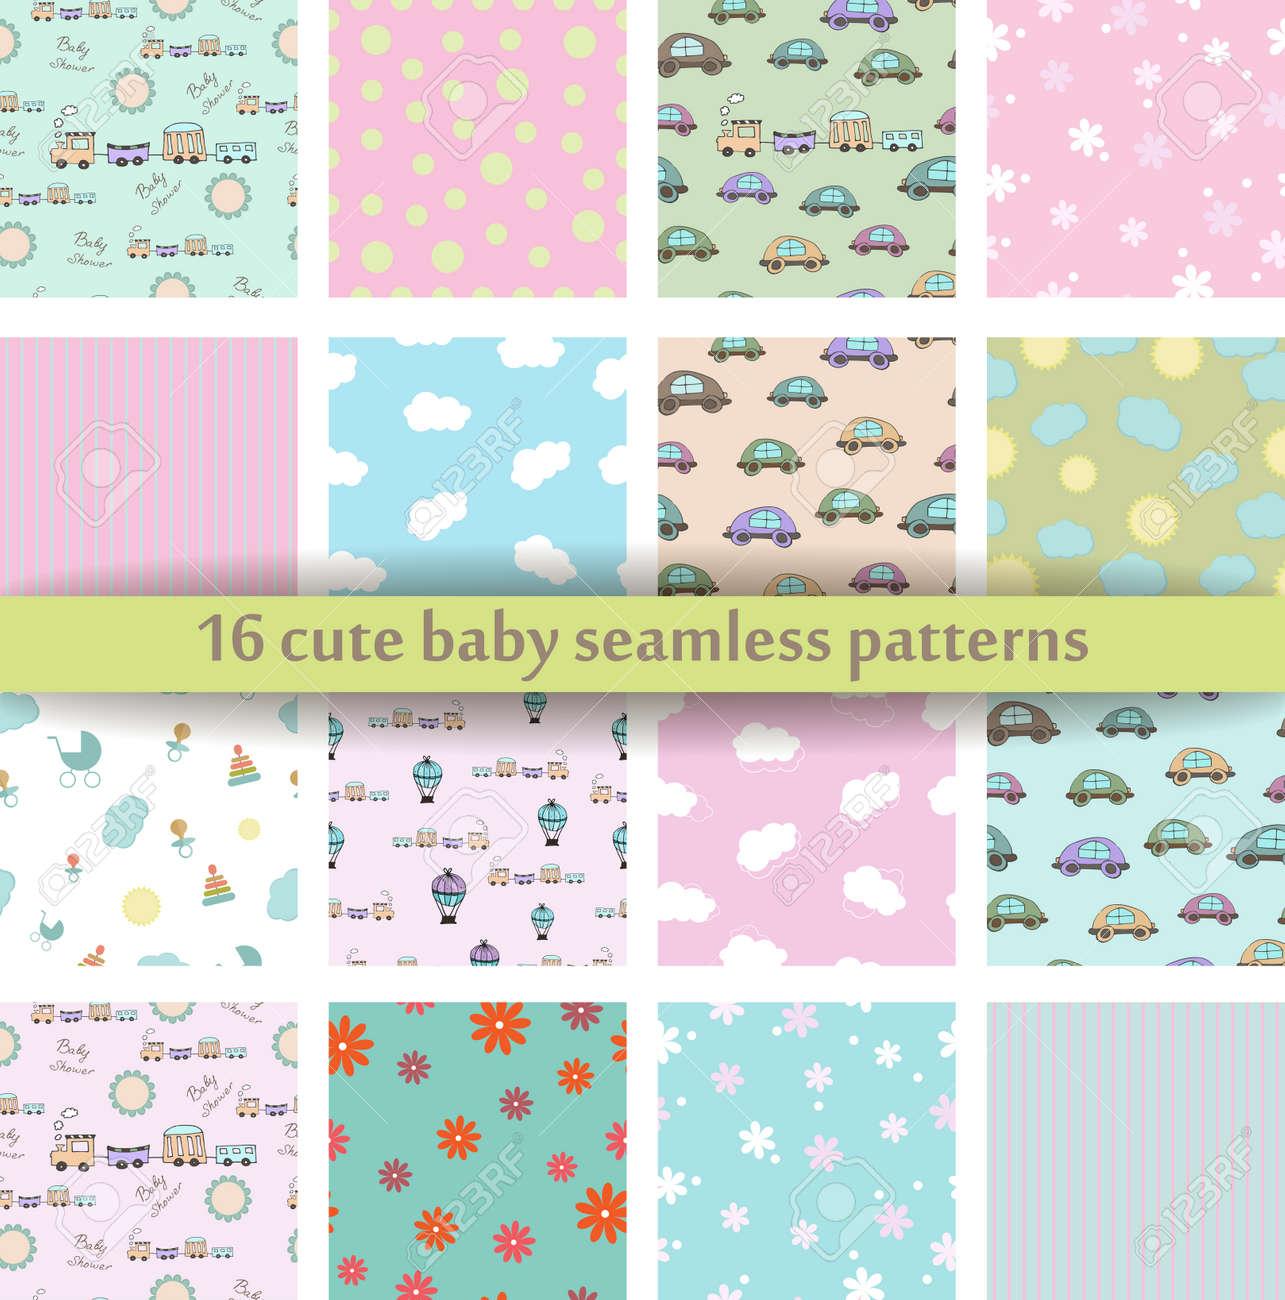 Set of 16 Cute baby seamless pattern. - 51247854